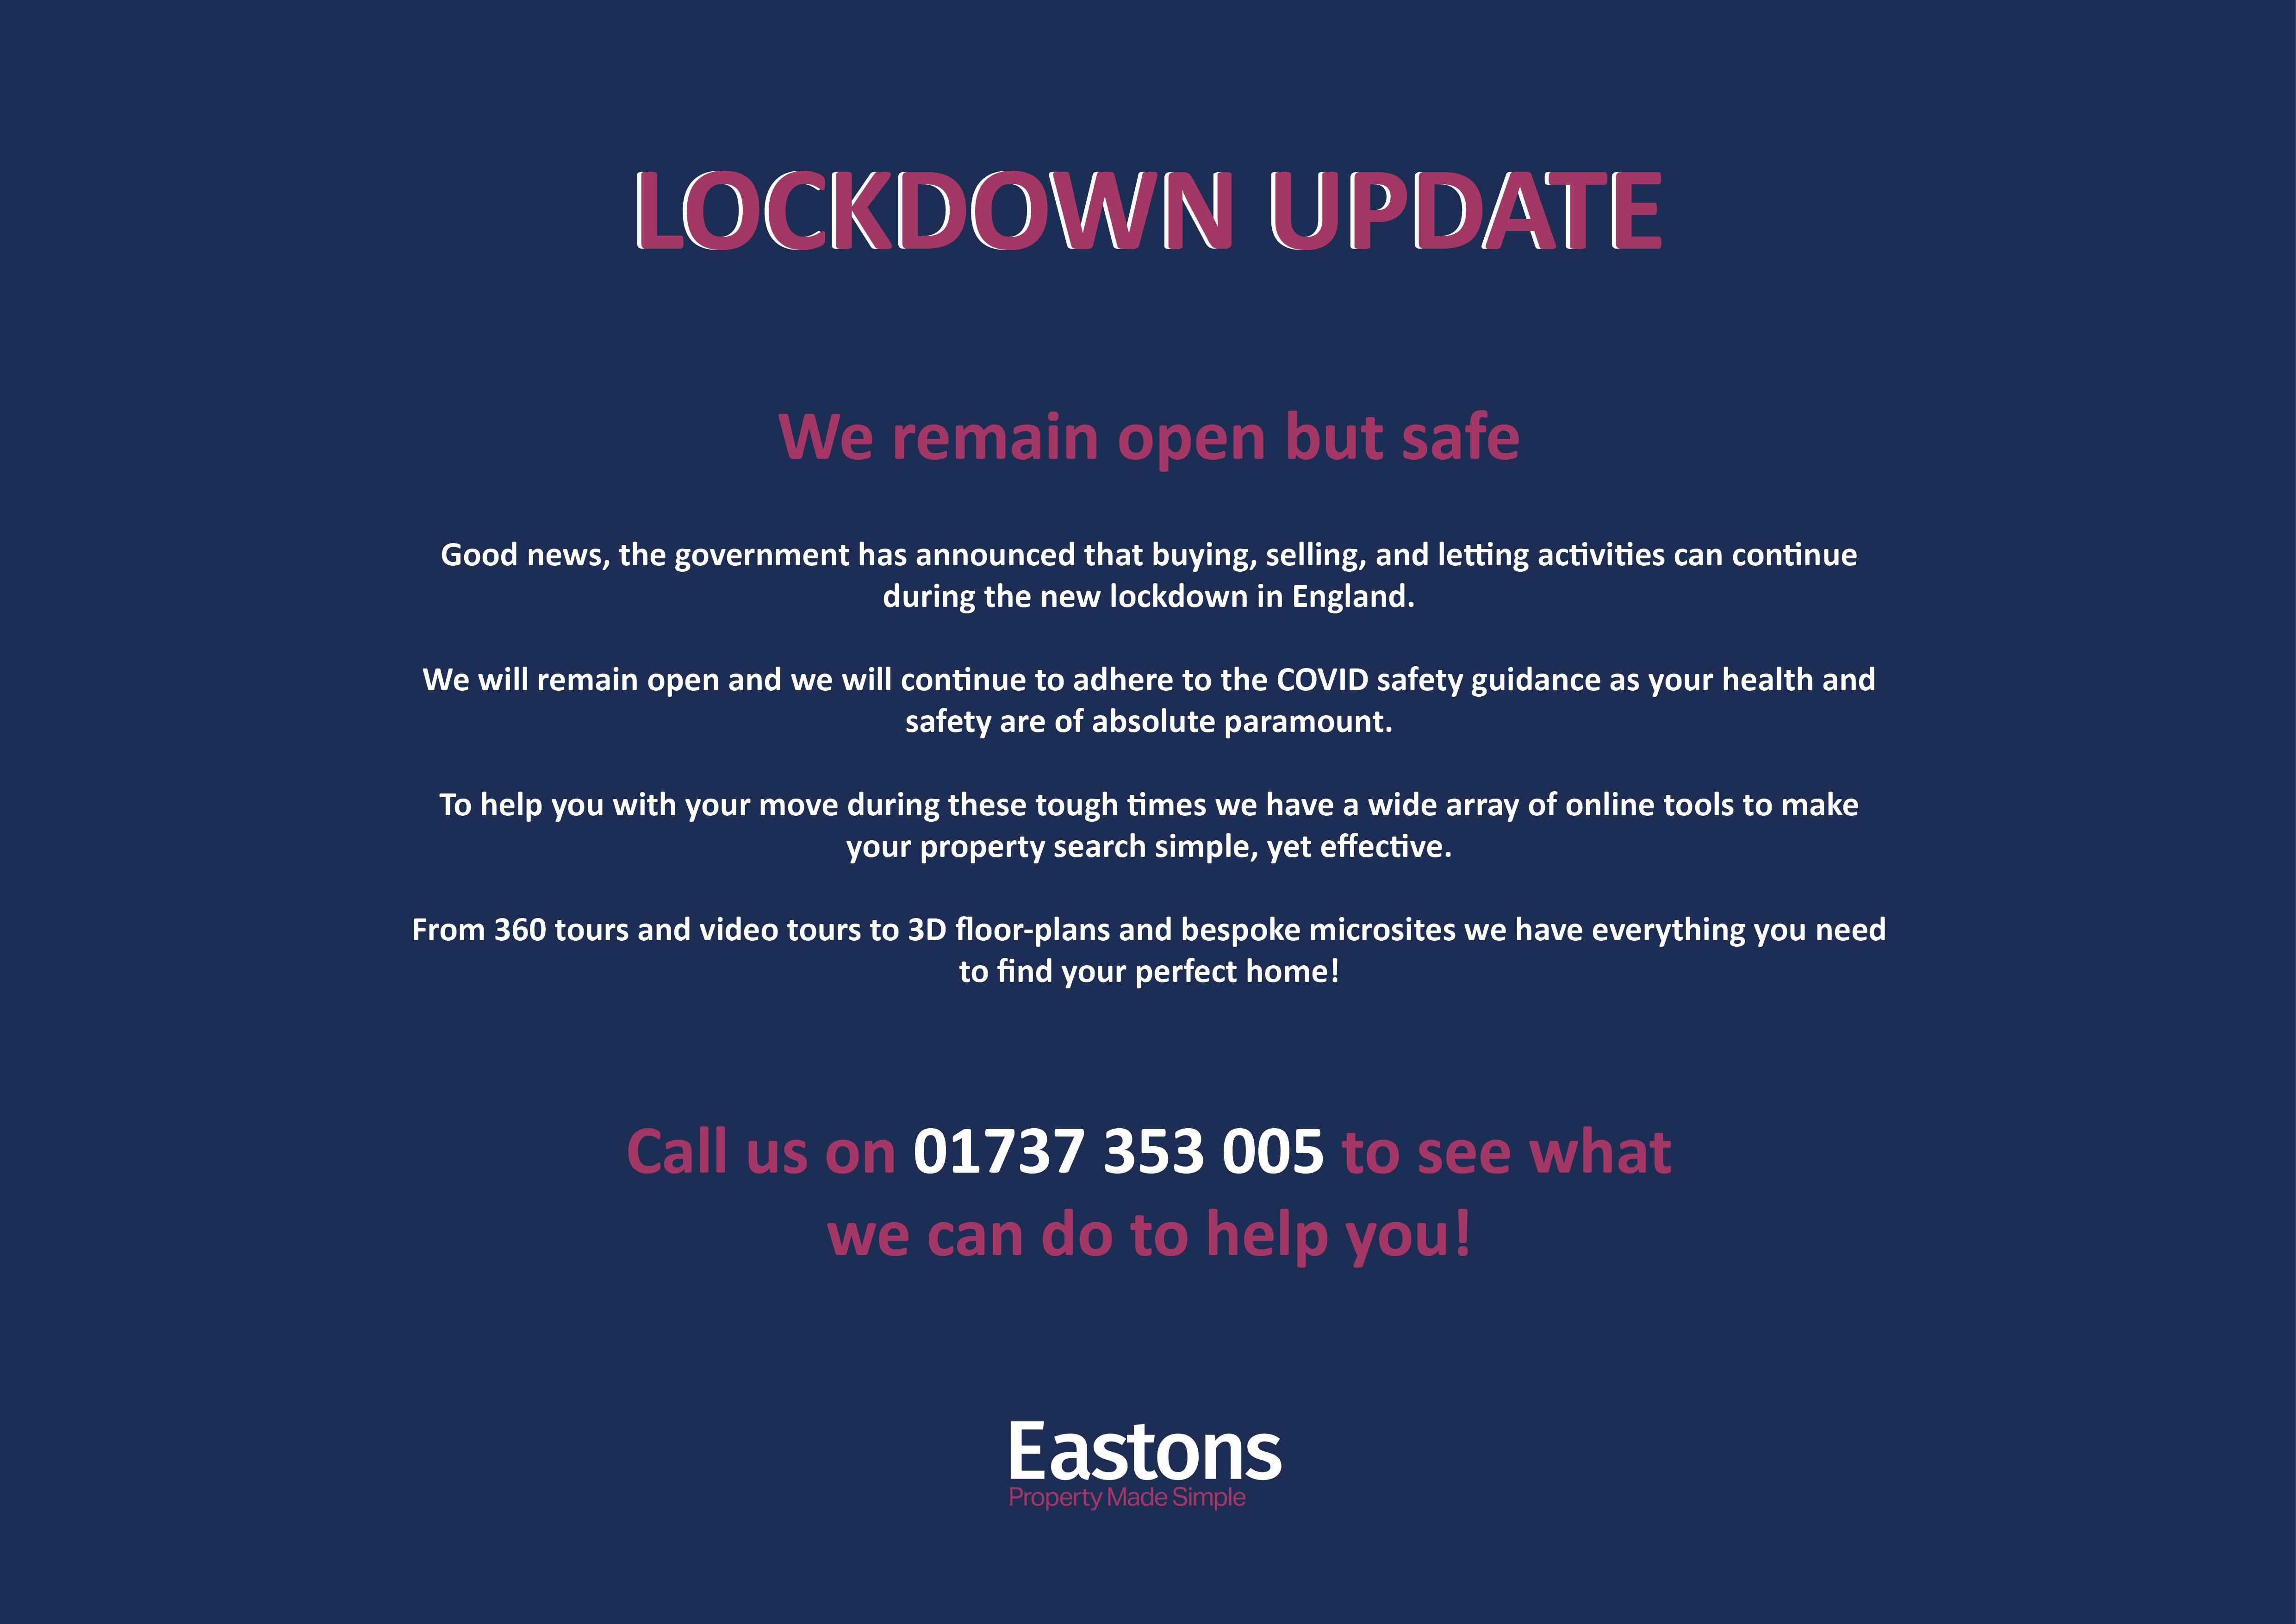 eastons_lockdown_3